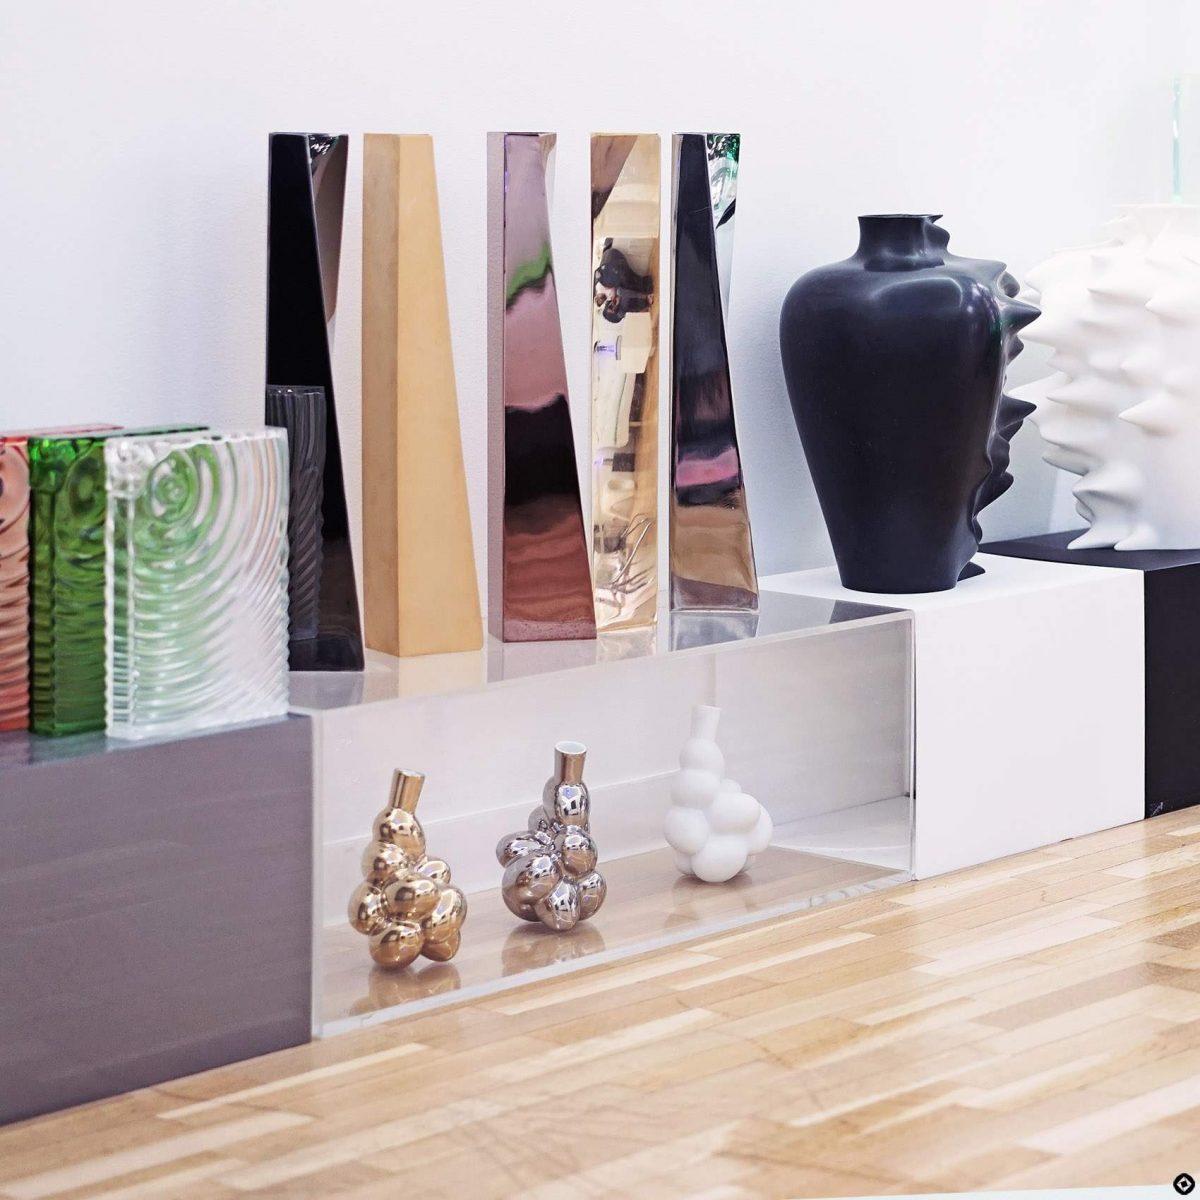 appartement-architecte-david-bitton-blog-design_9